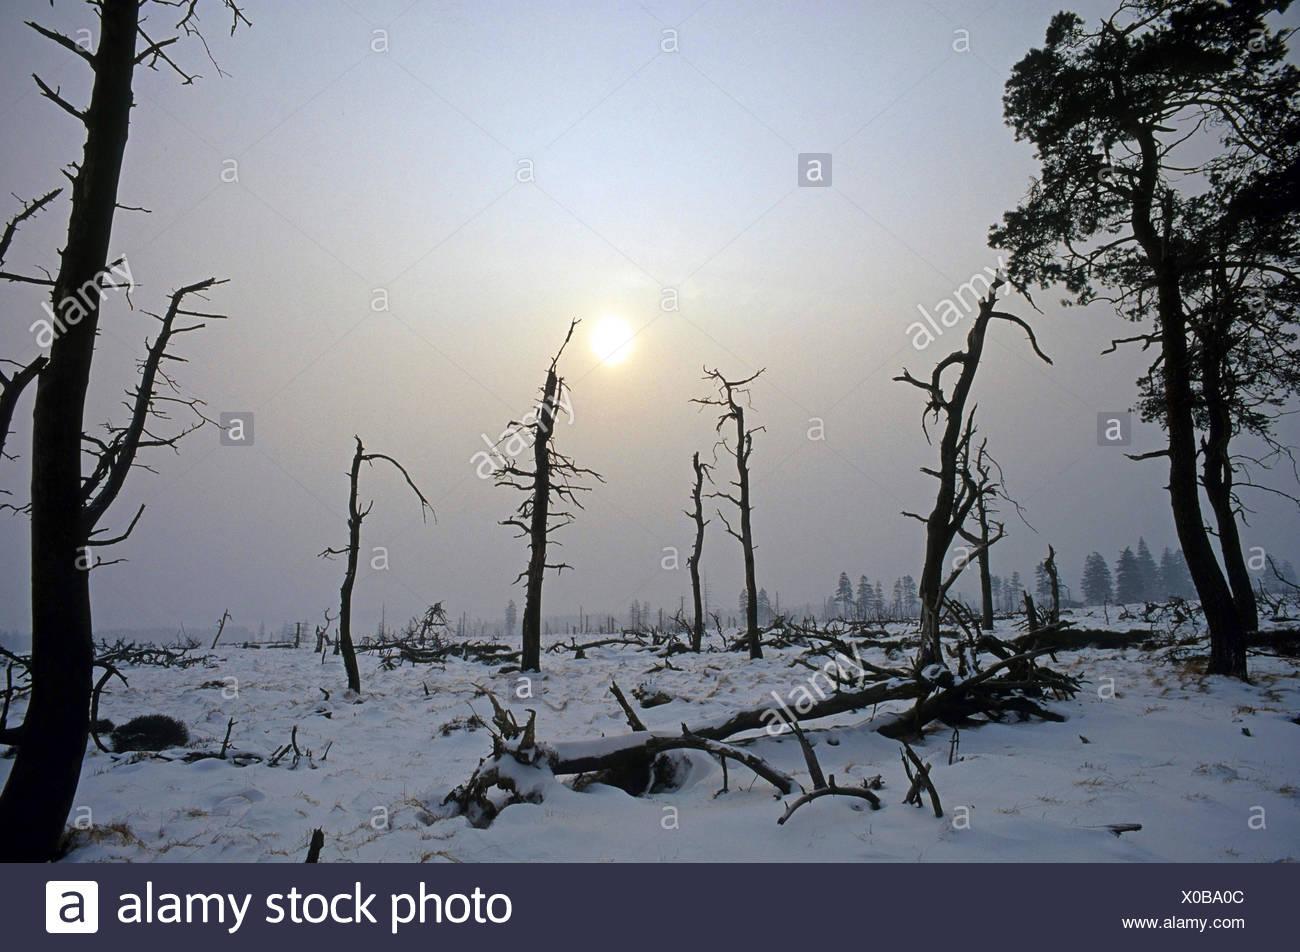 dead trees in front of an approaching winter storm, Belgium, Baraque de Michel, Hohes Venn-Ostbelgien Stock Photo